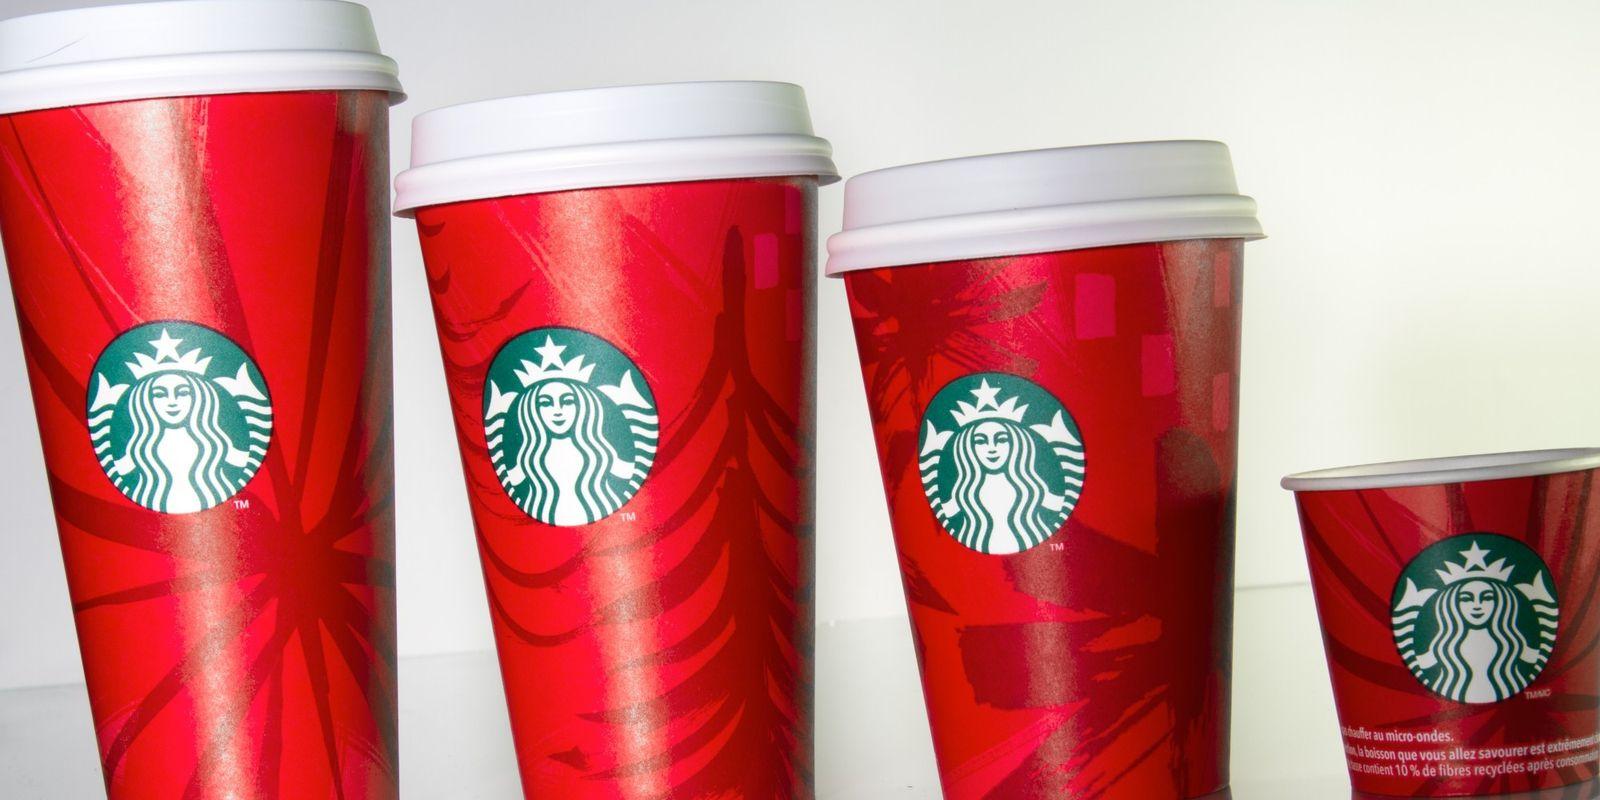 Why Heterosexual Men Should Boycott Starbucks  Return Of